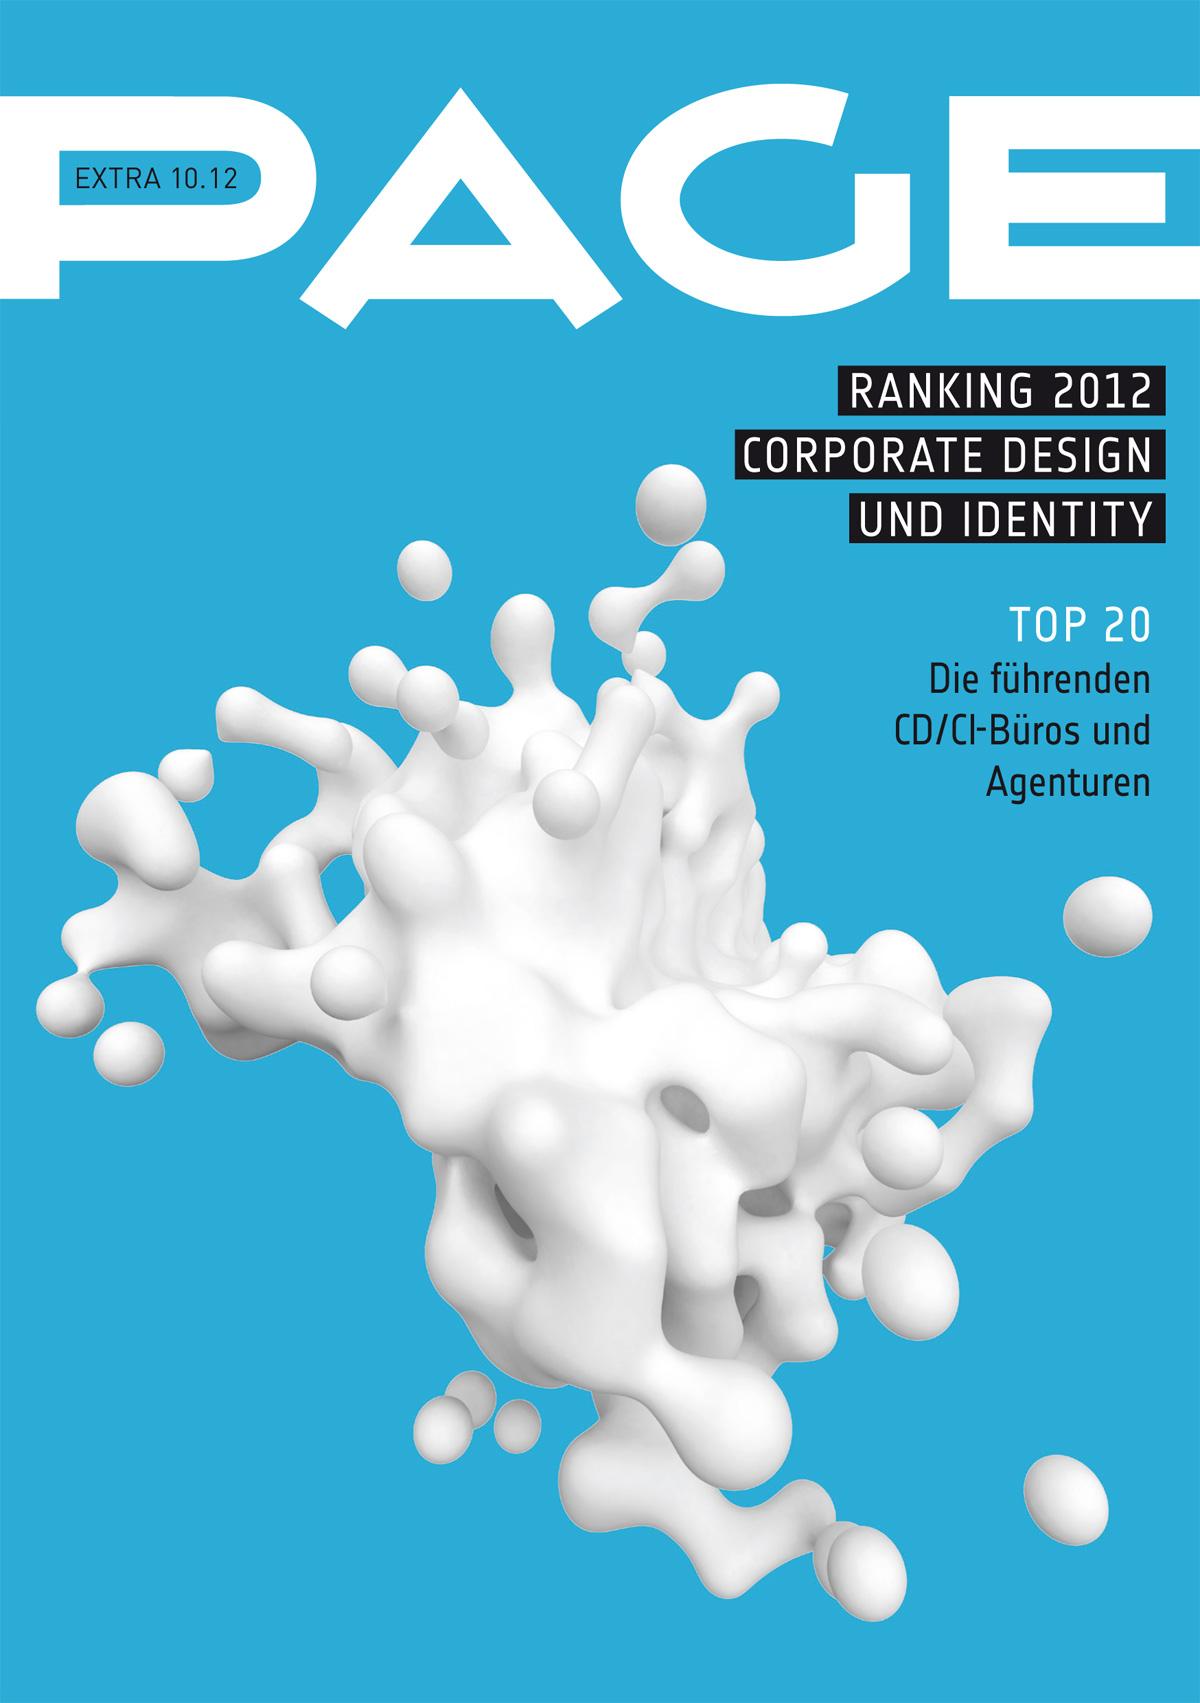 CD_CI_Ranking_2012